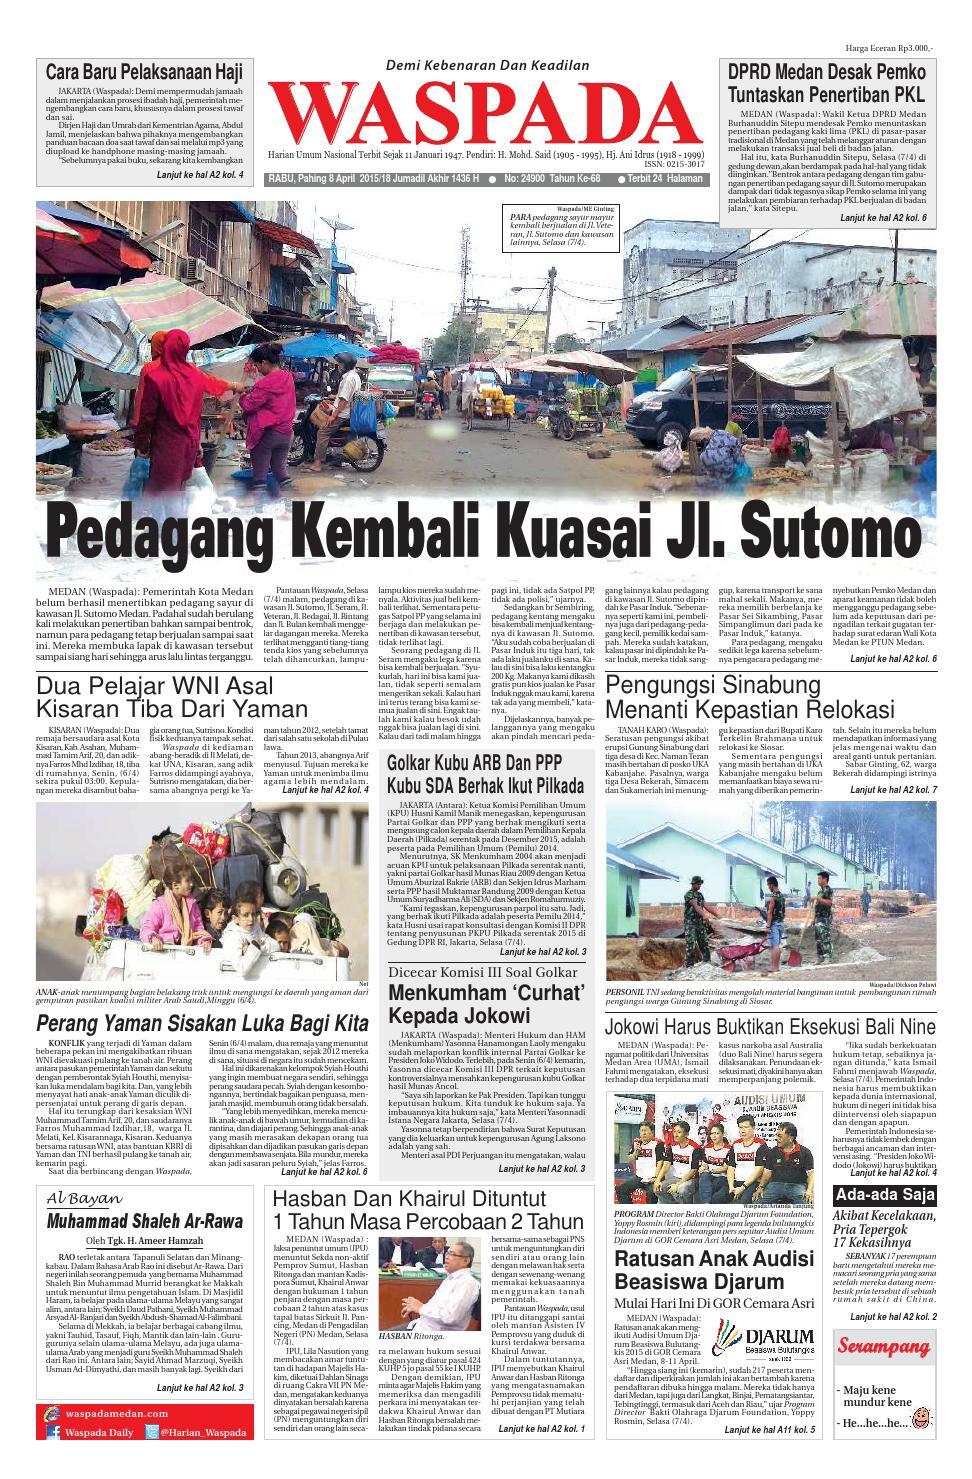 Waspada Rabu 8 April 2015 By Harian Issuu Produk Ukm Bumn Batik Lengan Panjang Parang Toko Ngremboko